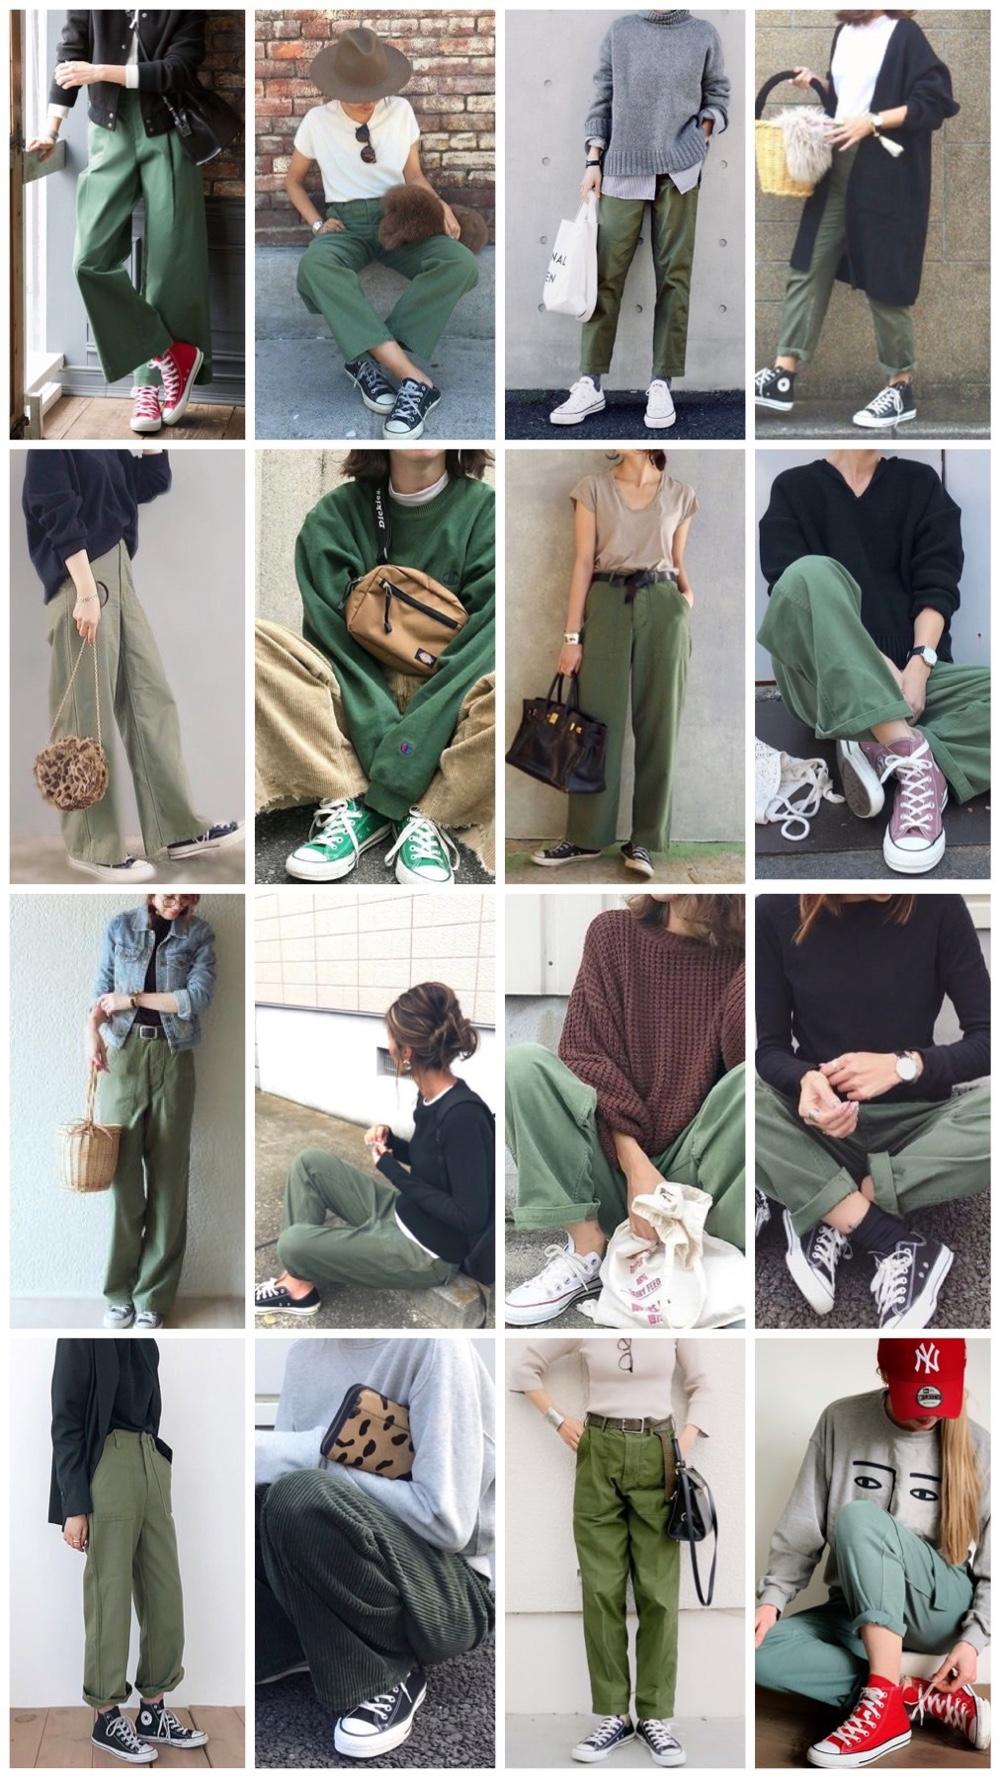 groene broeken en all stars outfitpost